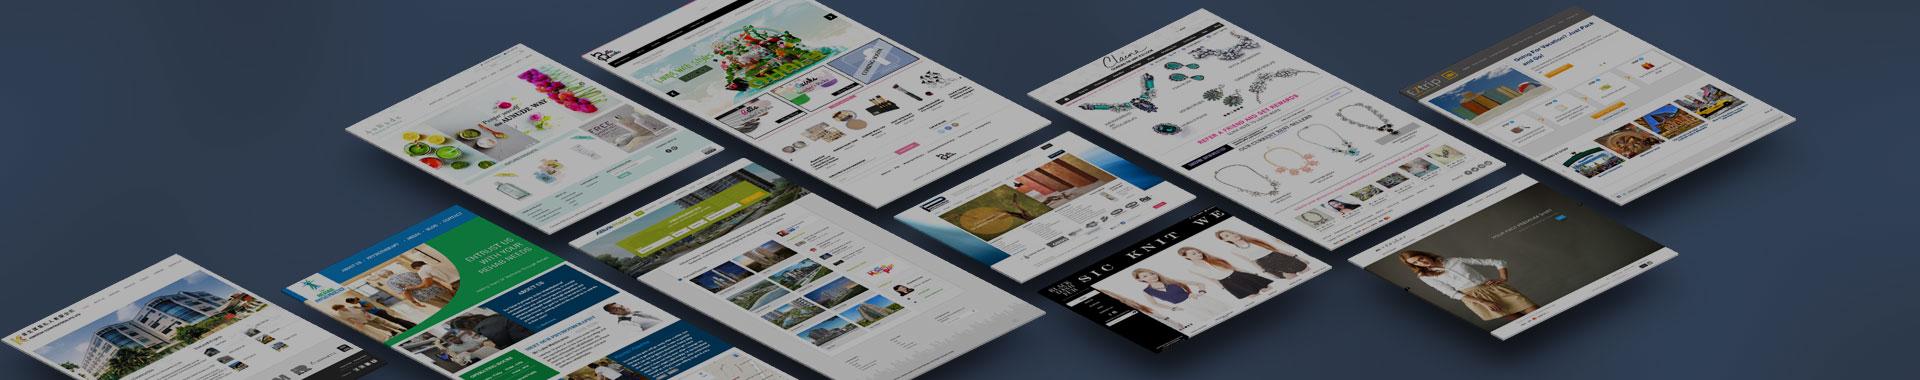 Website Design Singapore - ShippingBaron